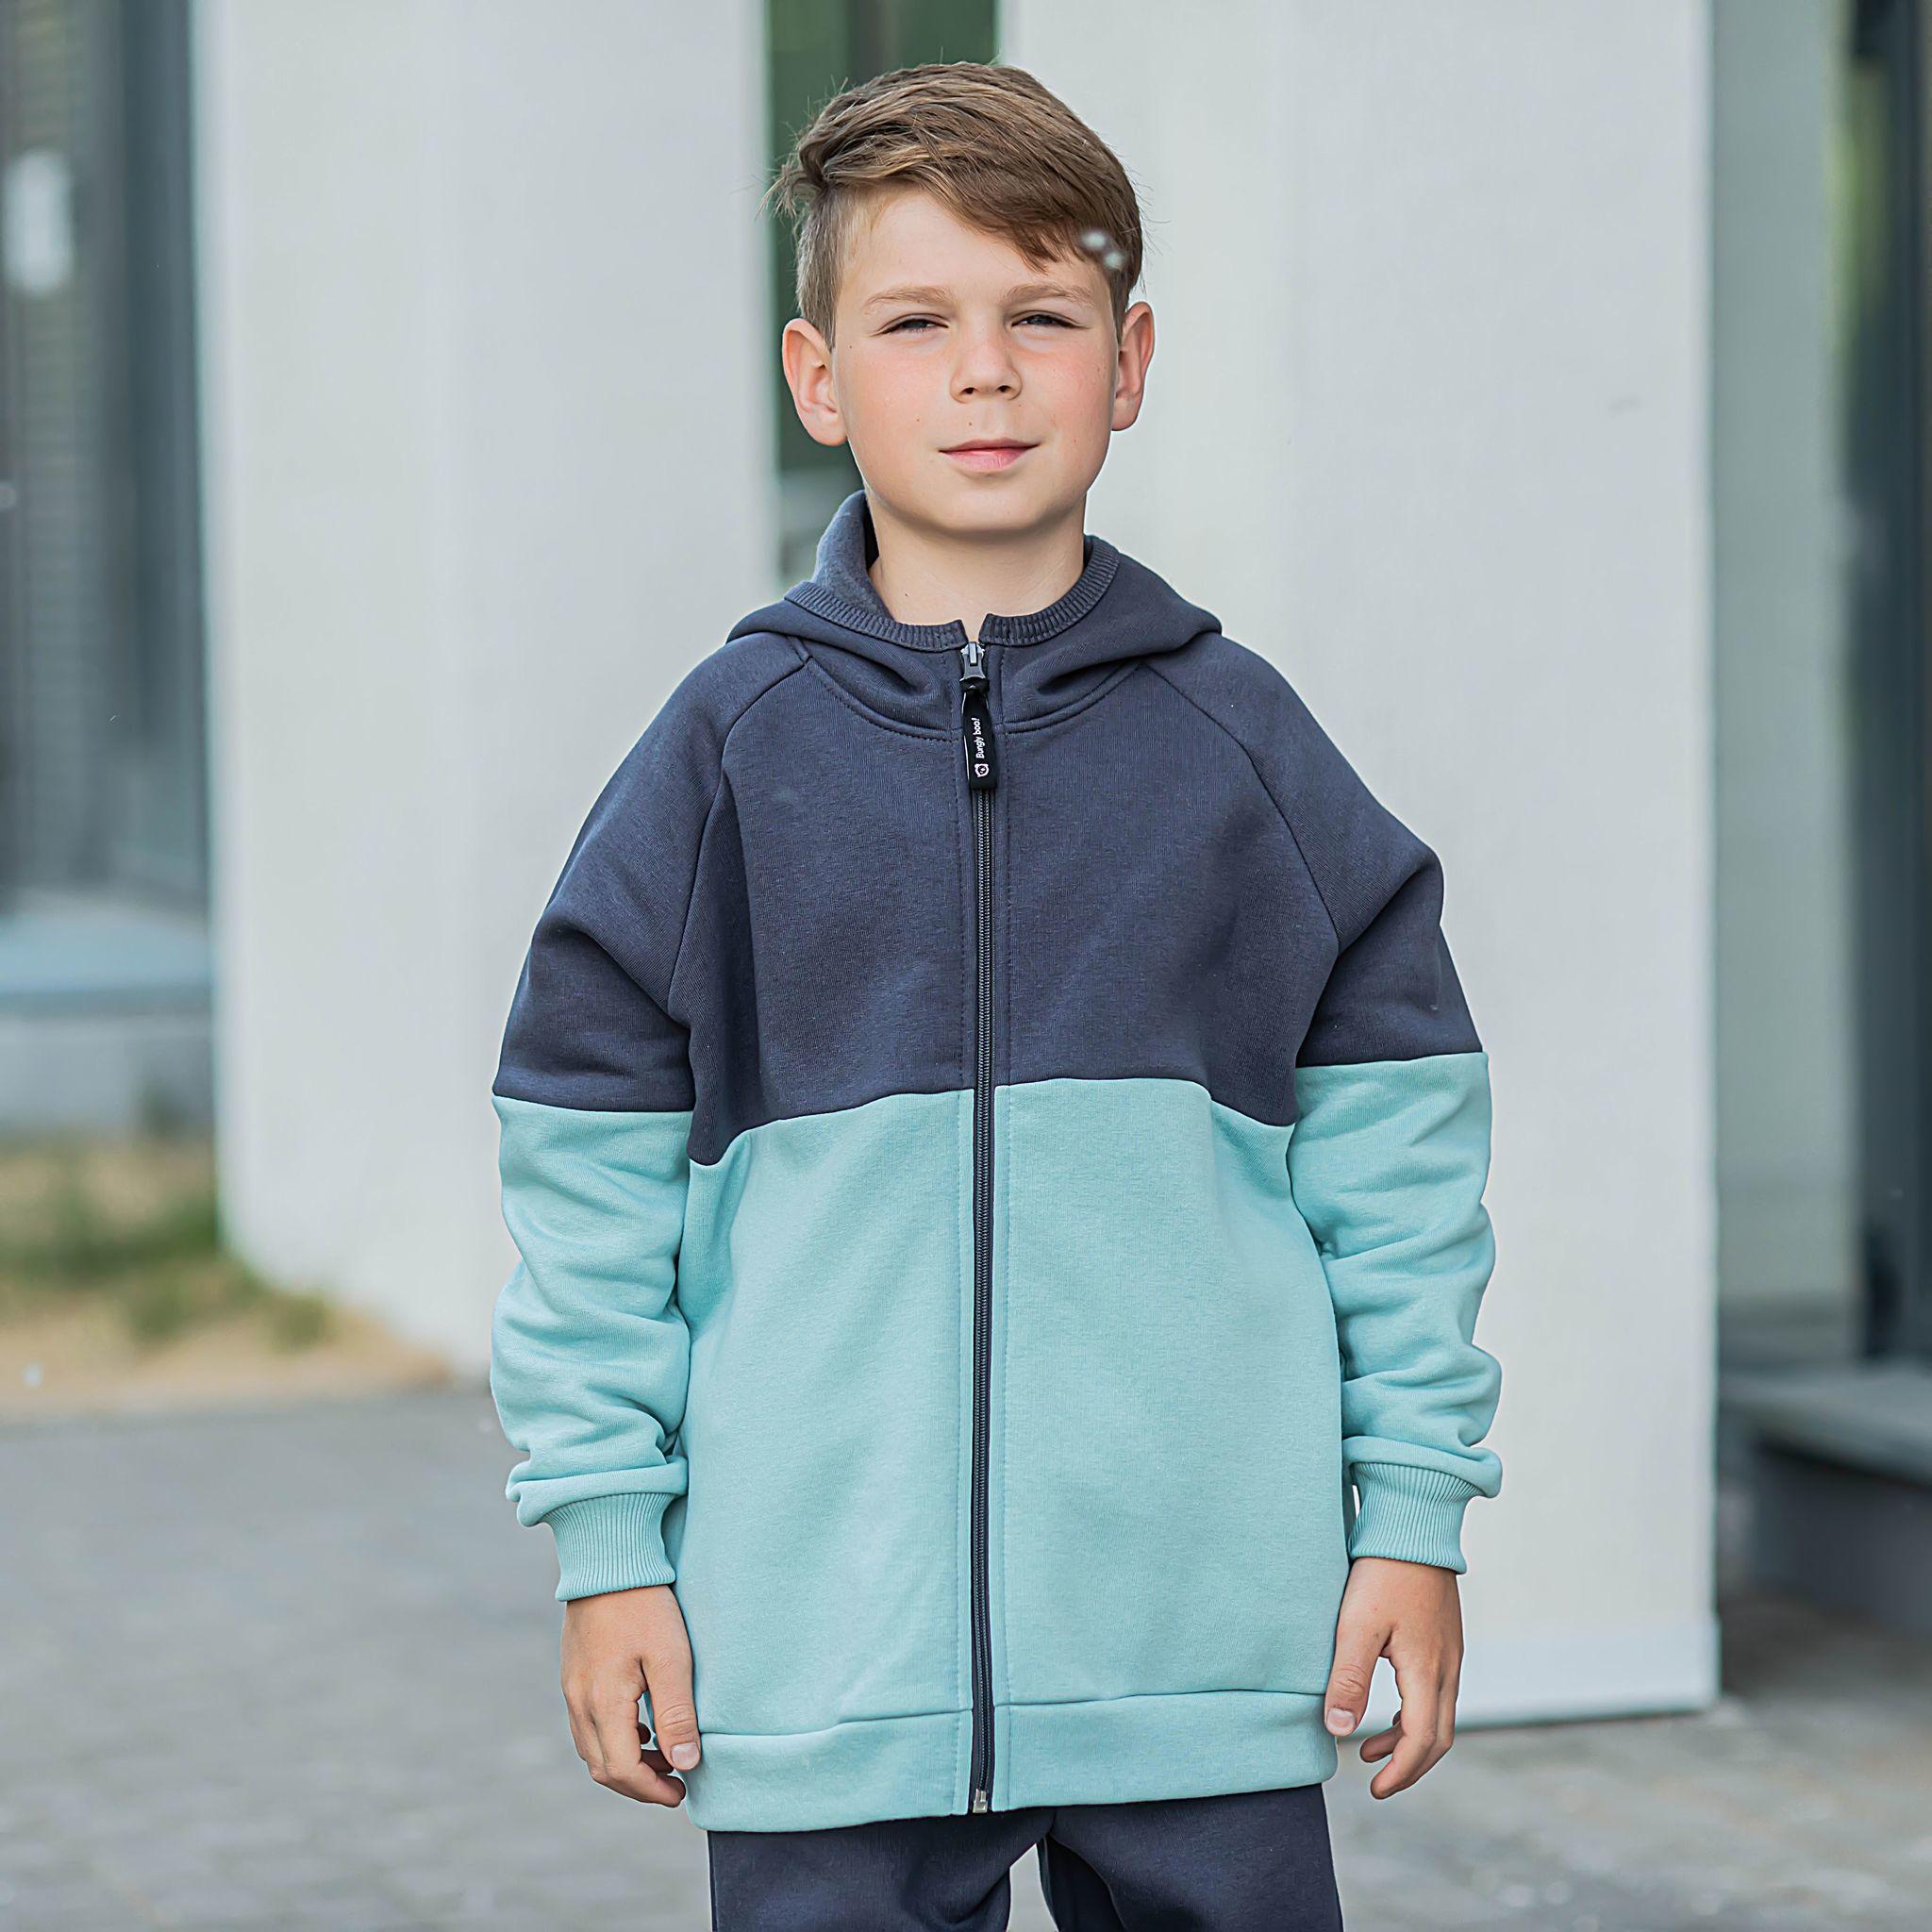 Color block warm sweatshirt for teens - Graphite/Sea Blue